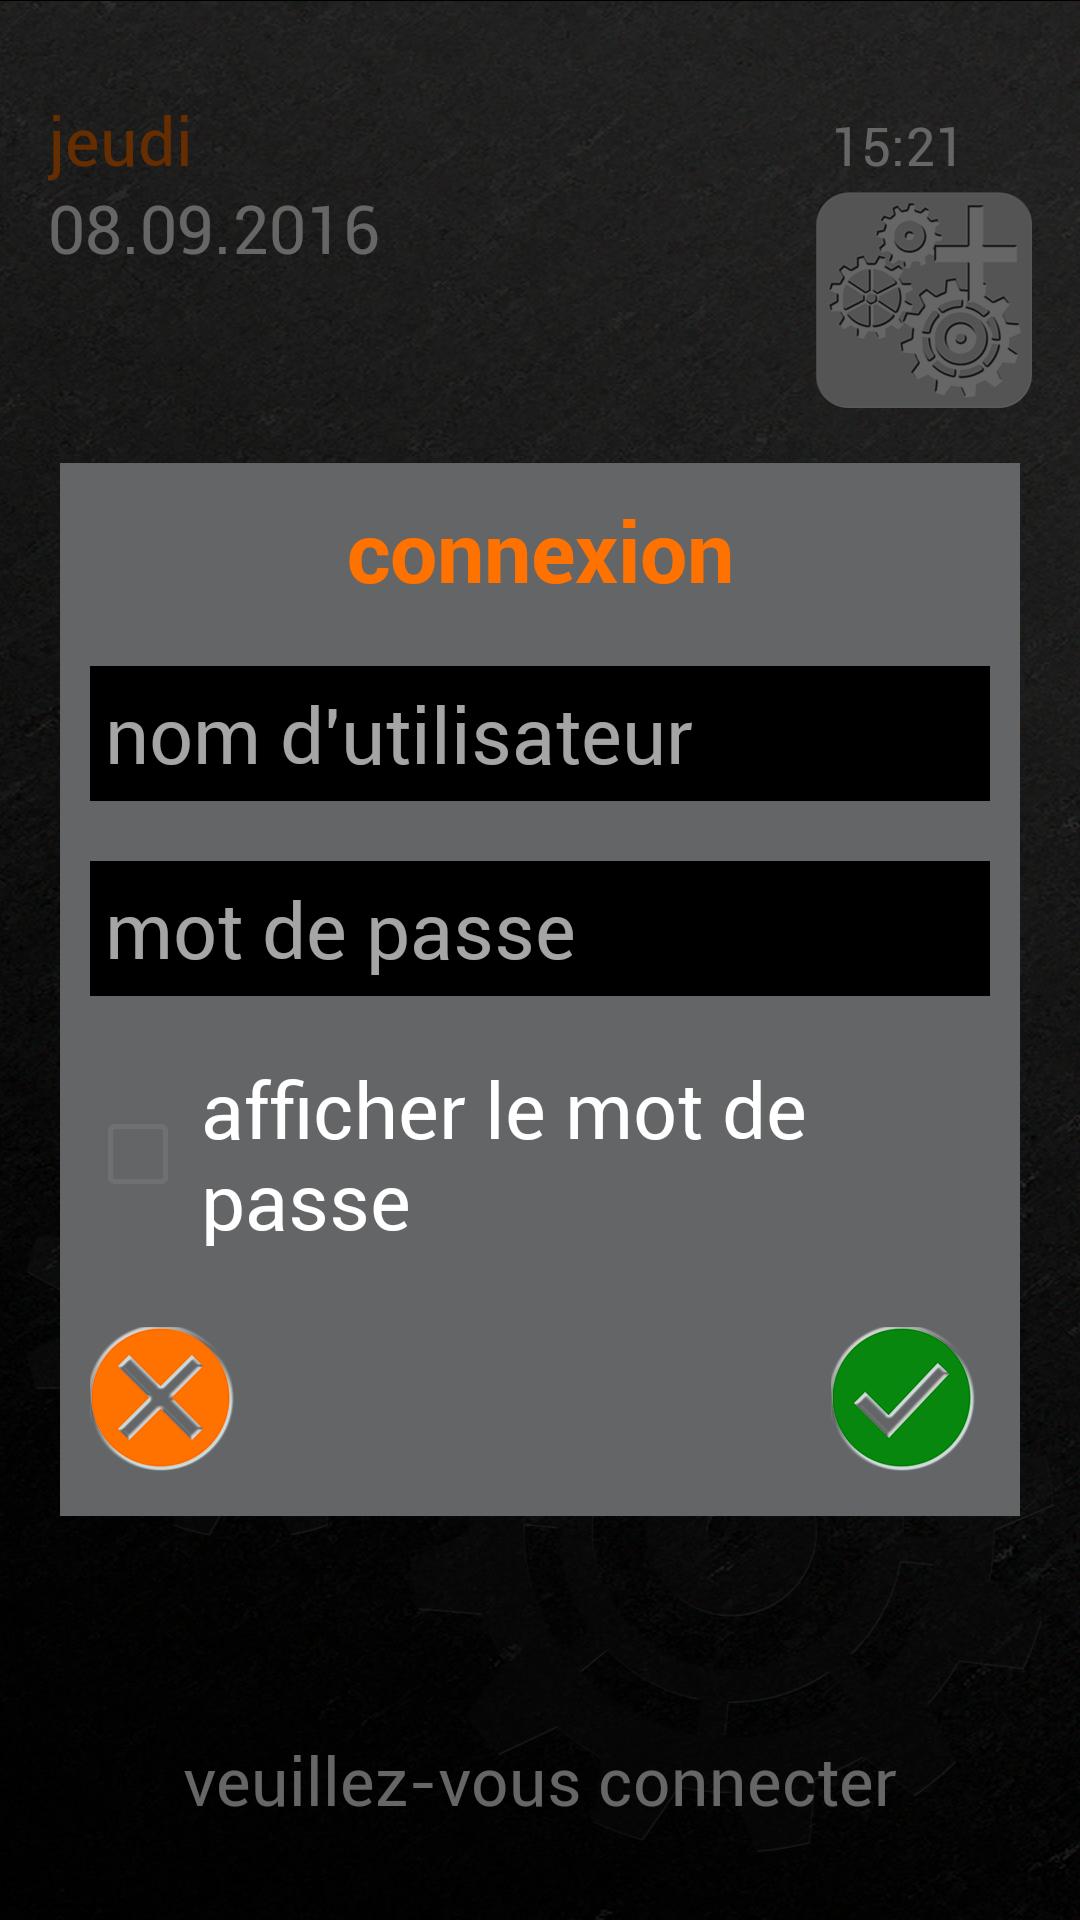 ginstr_app_industrialMaintenanceManagerPlus_FR_2